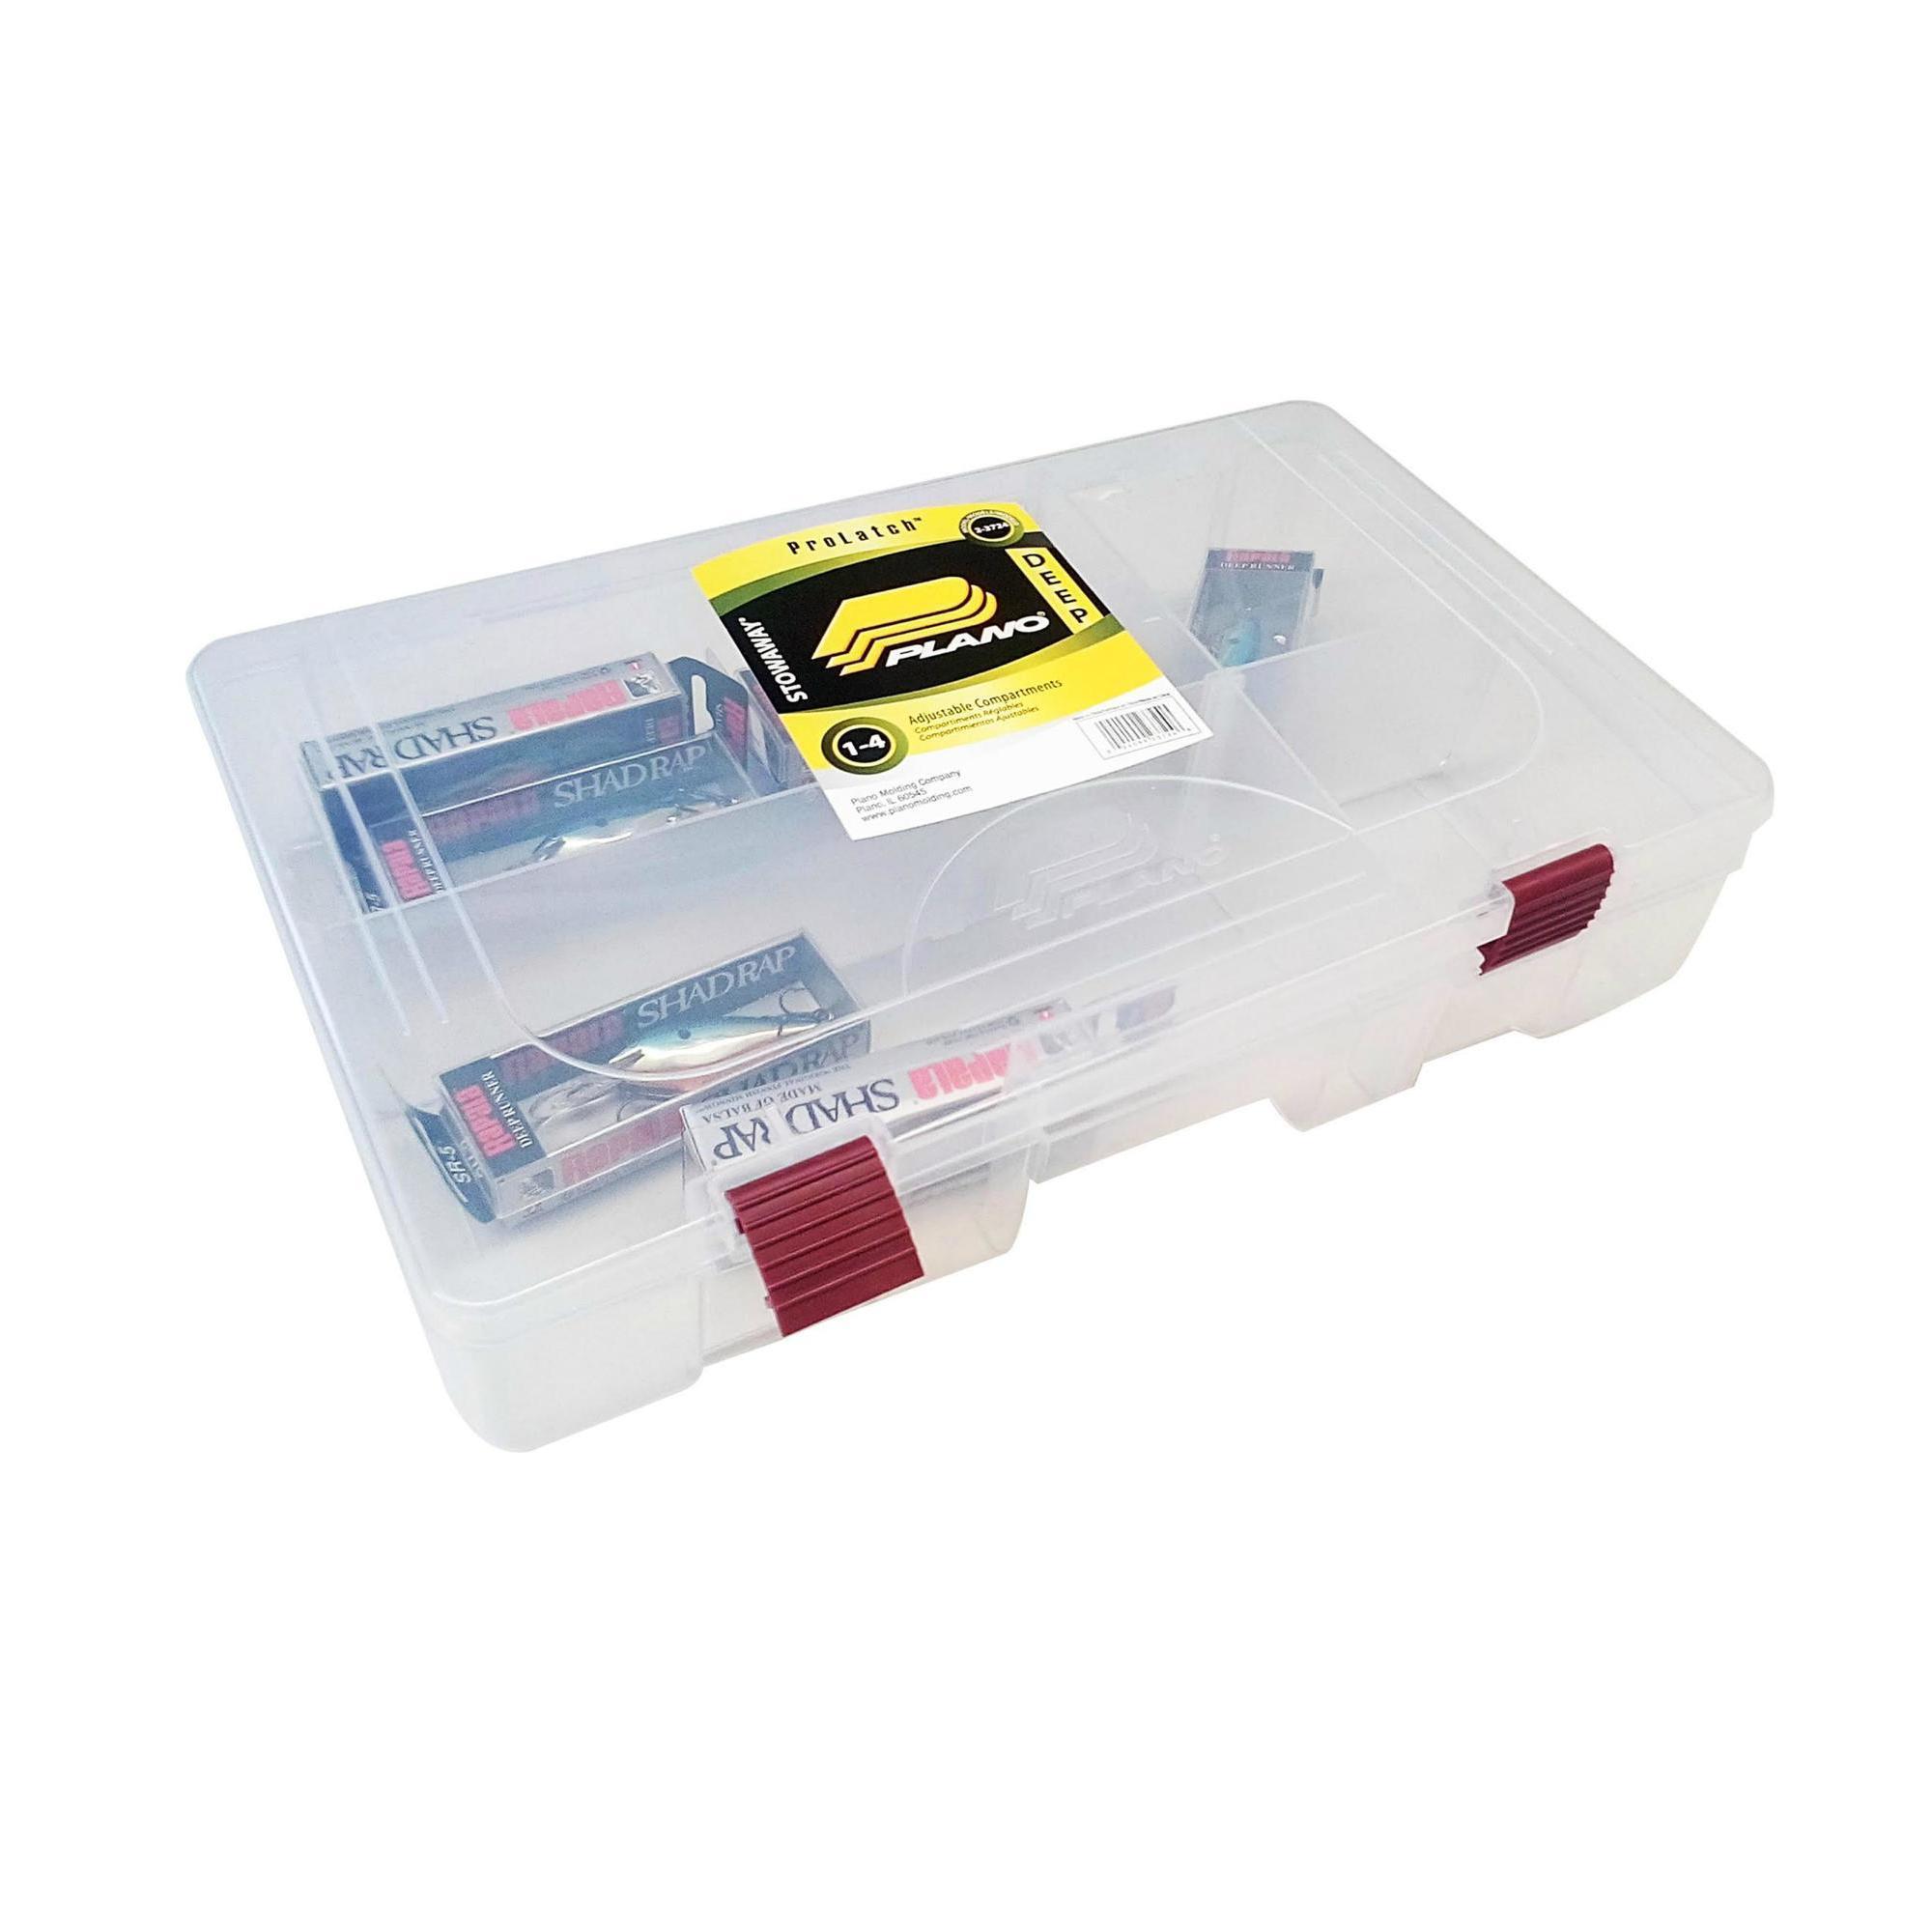 a2ba86d09a2 Comprar Cajas Pesca Surfcasting online | Decathlon